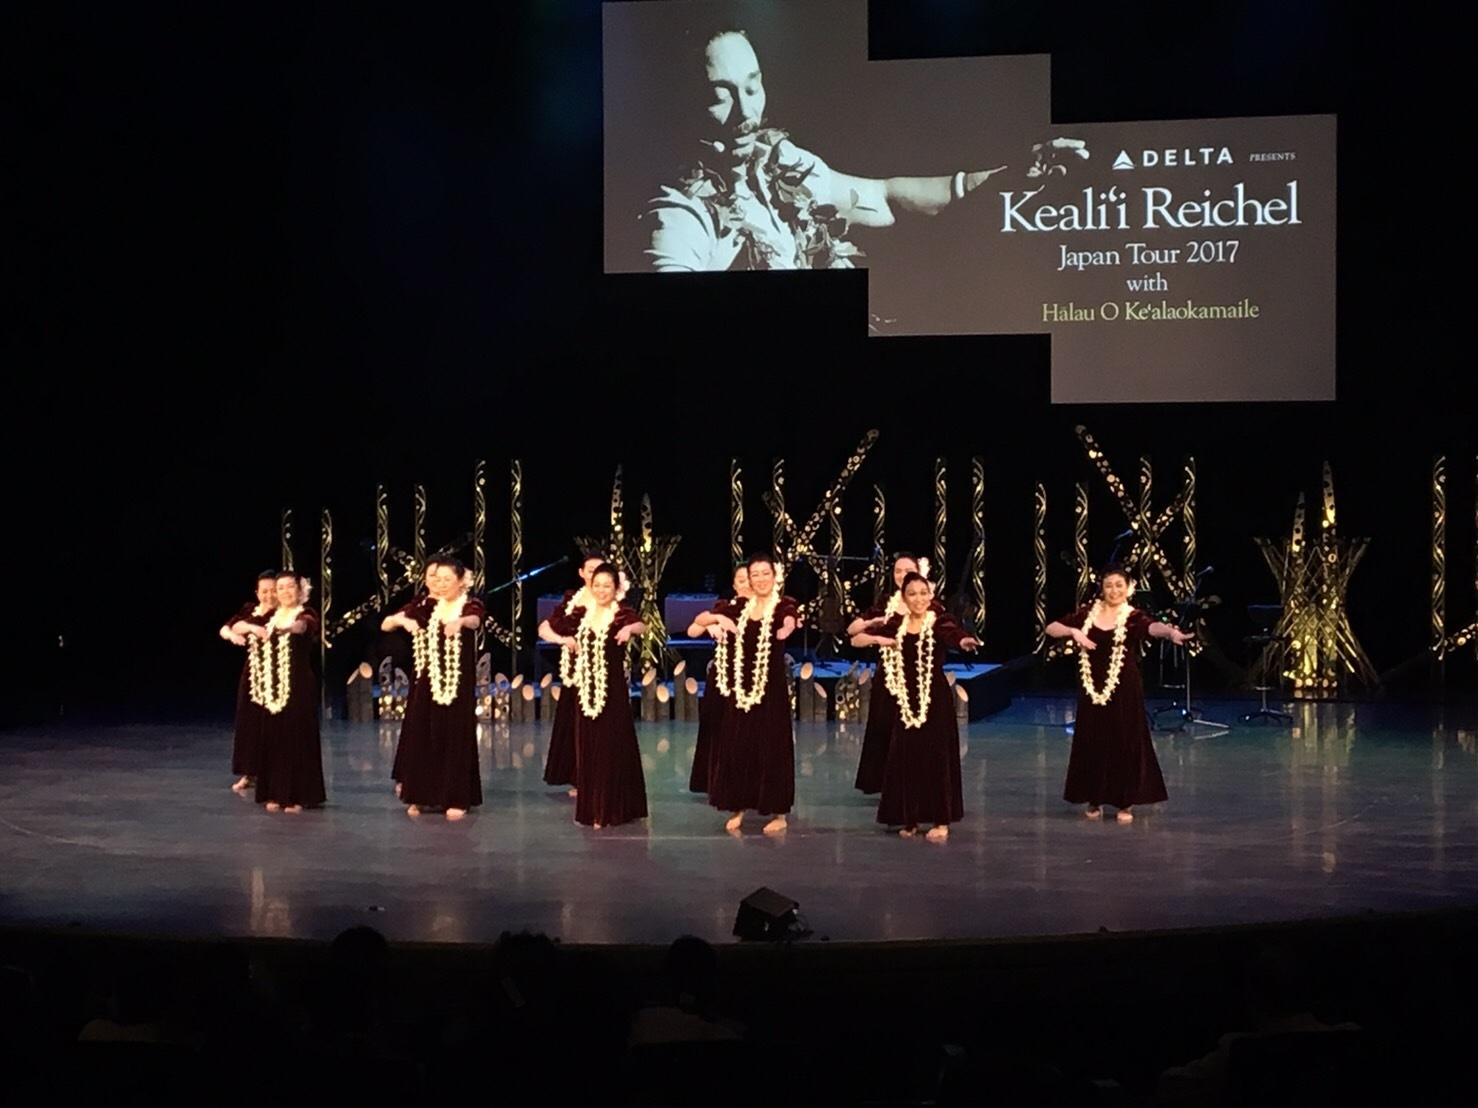 Kealiʻi Reichel Japan Tour 2017_d0256587_21092198.jpeg